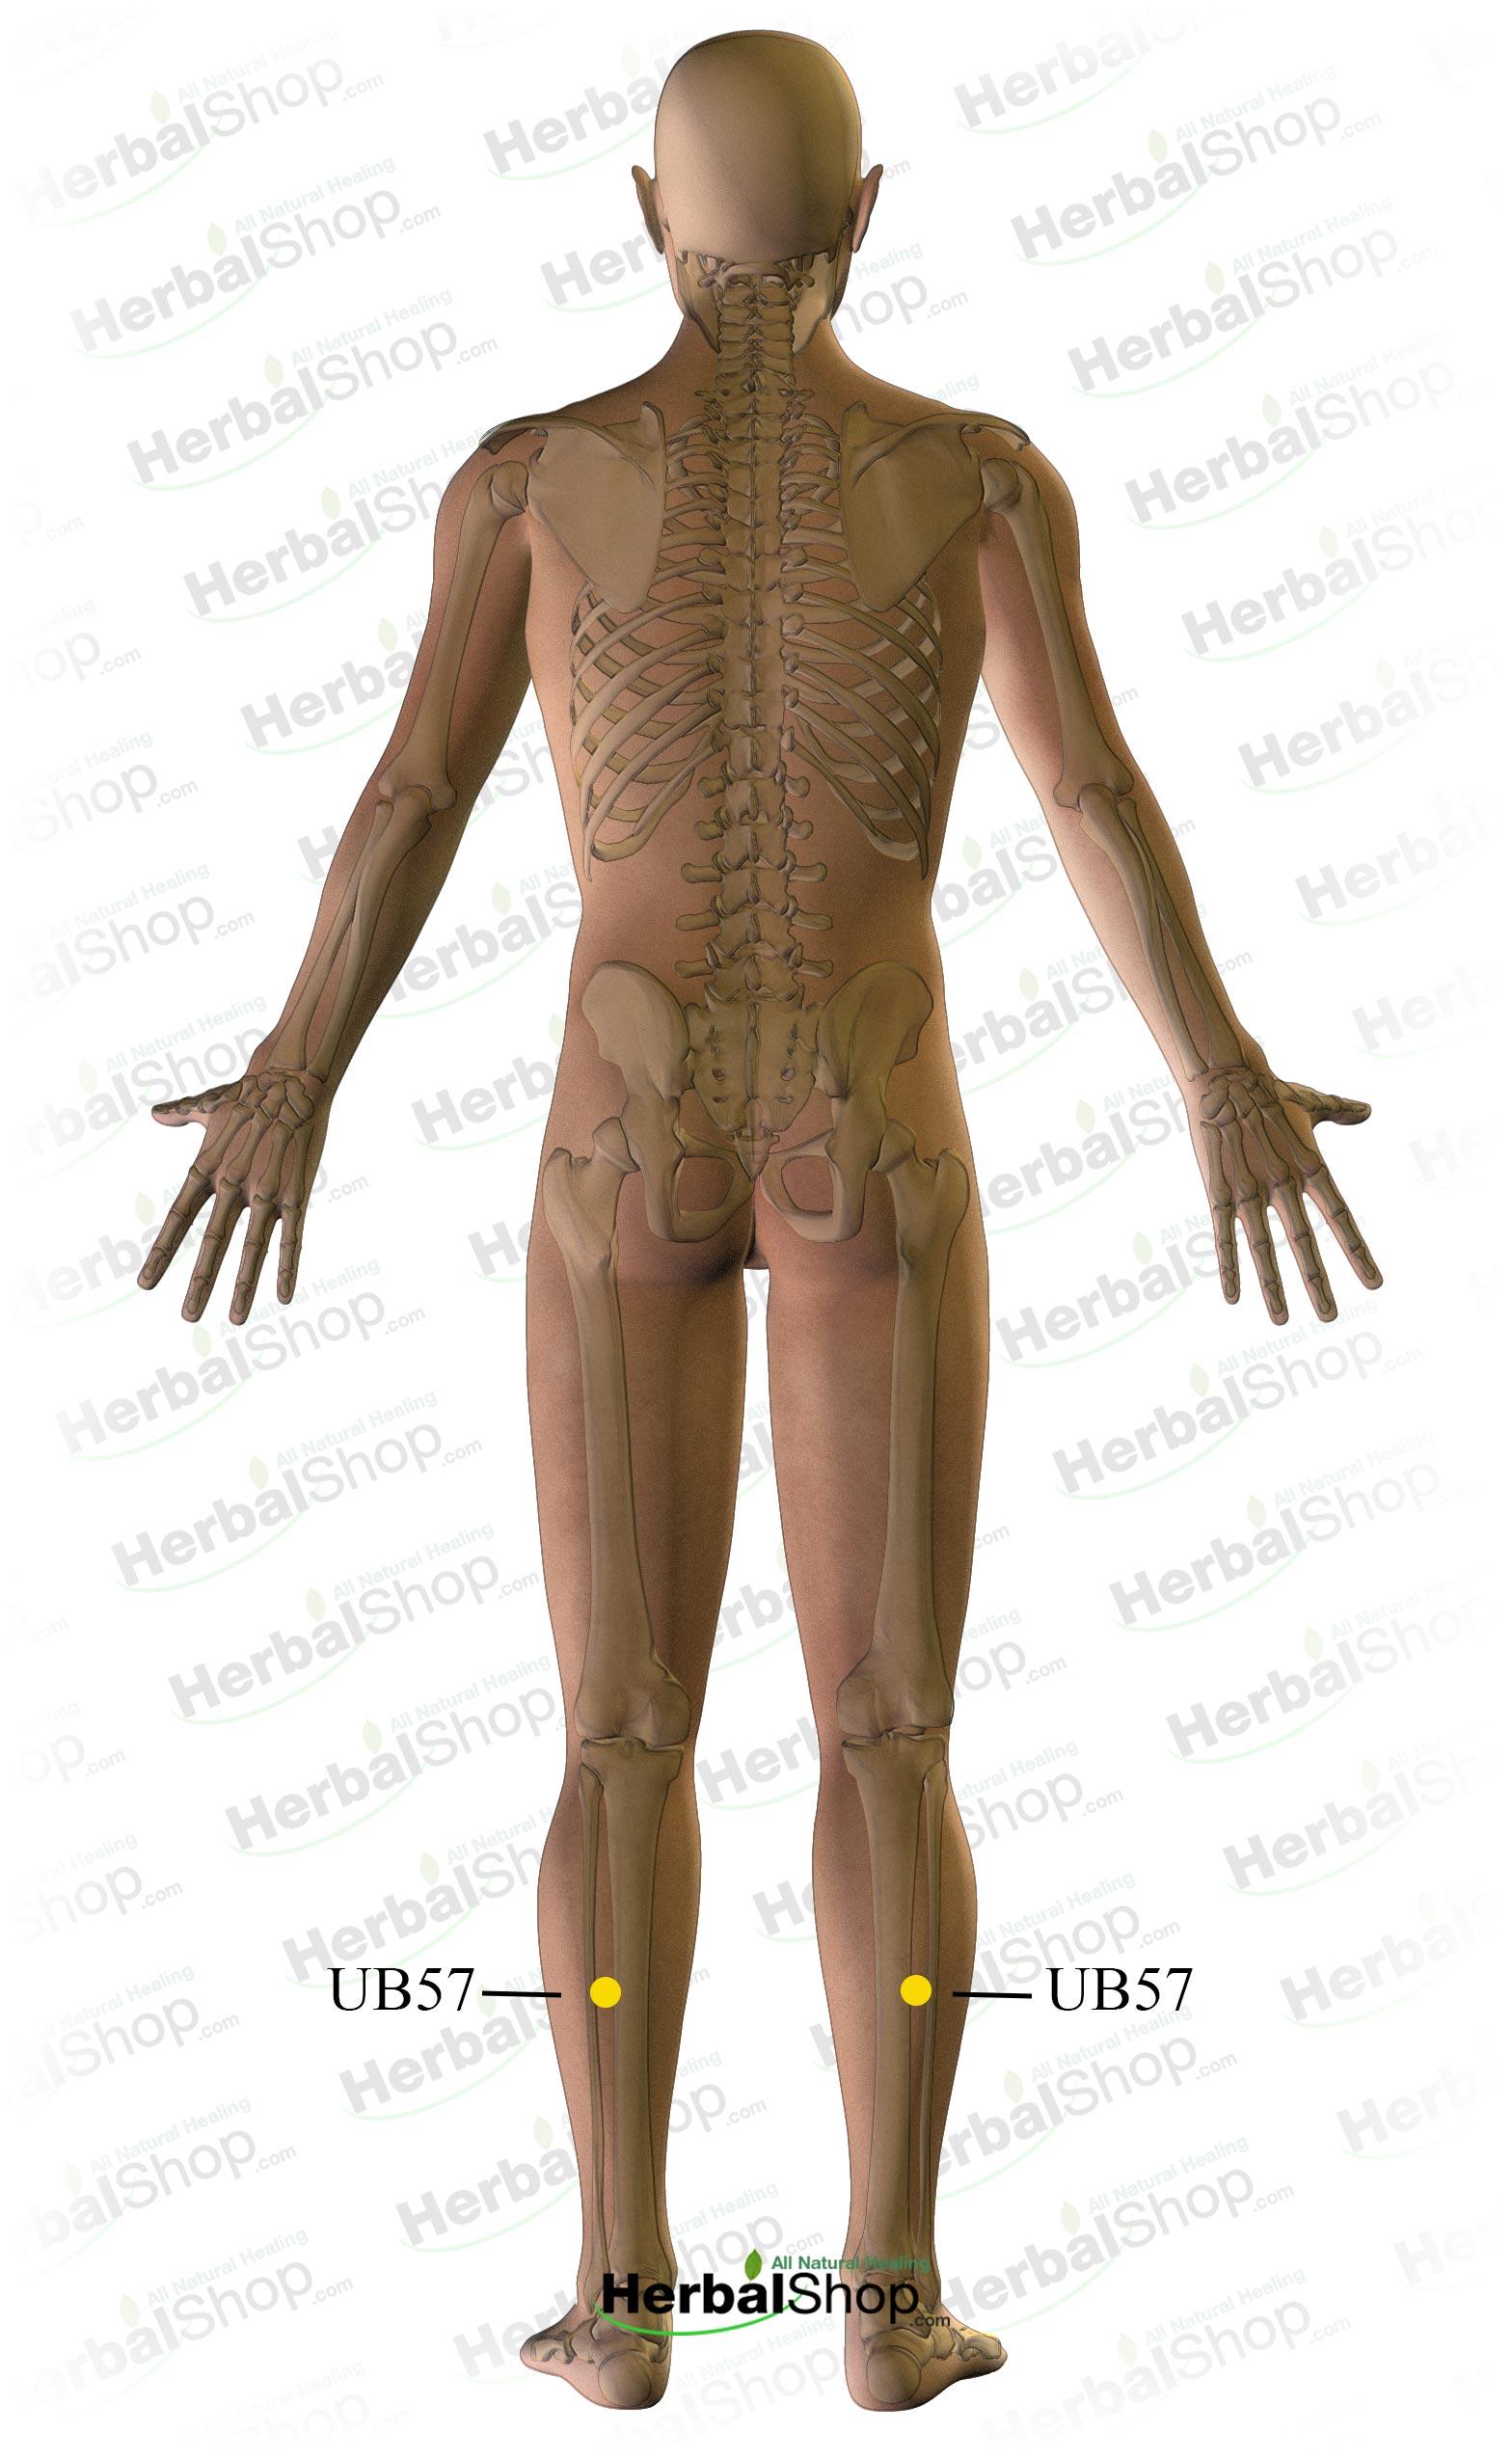 Hemorrhoids - Bleeding or Irritation